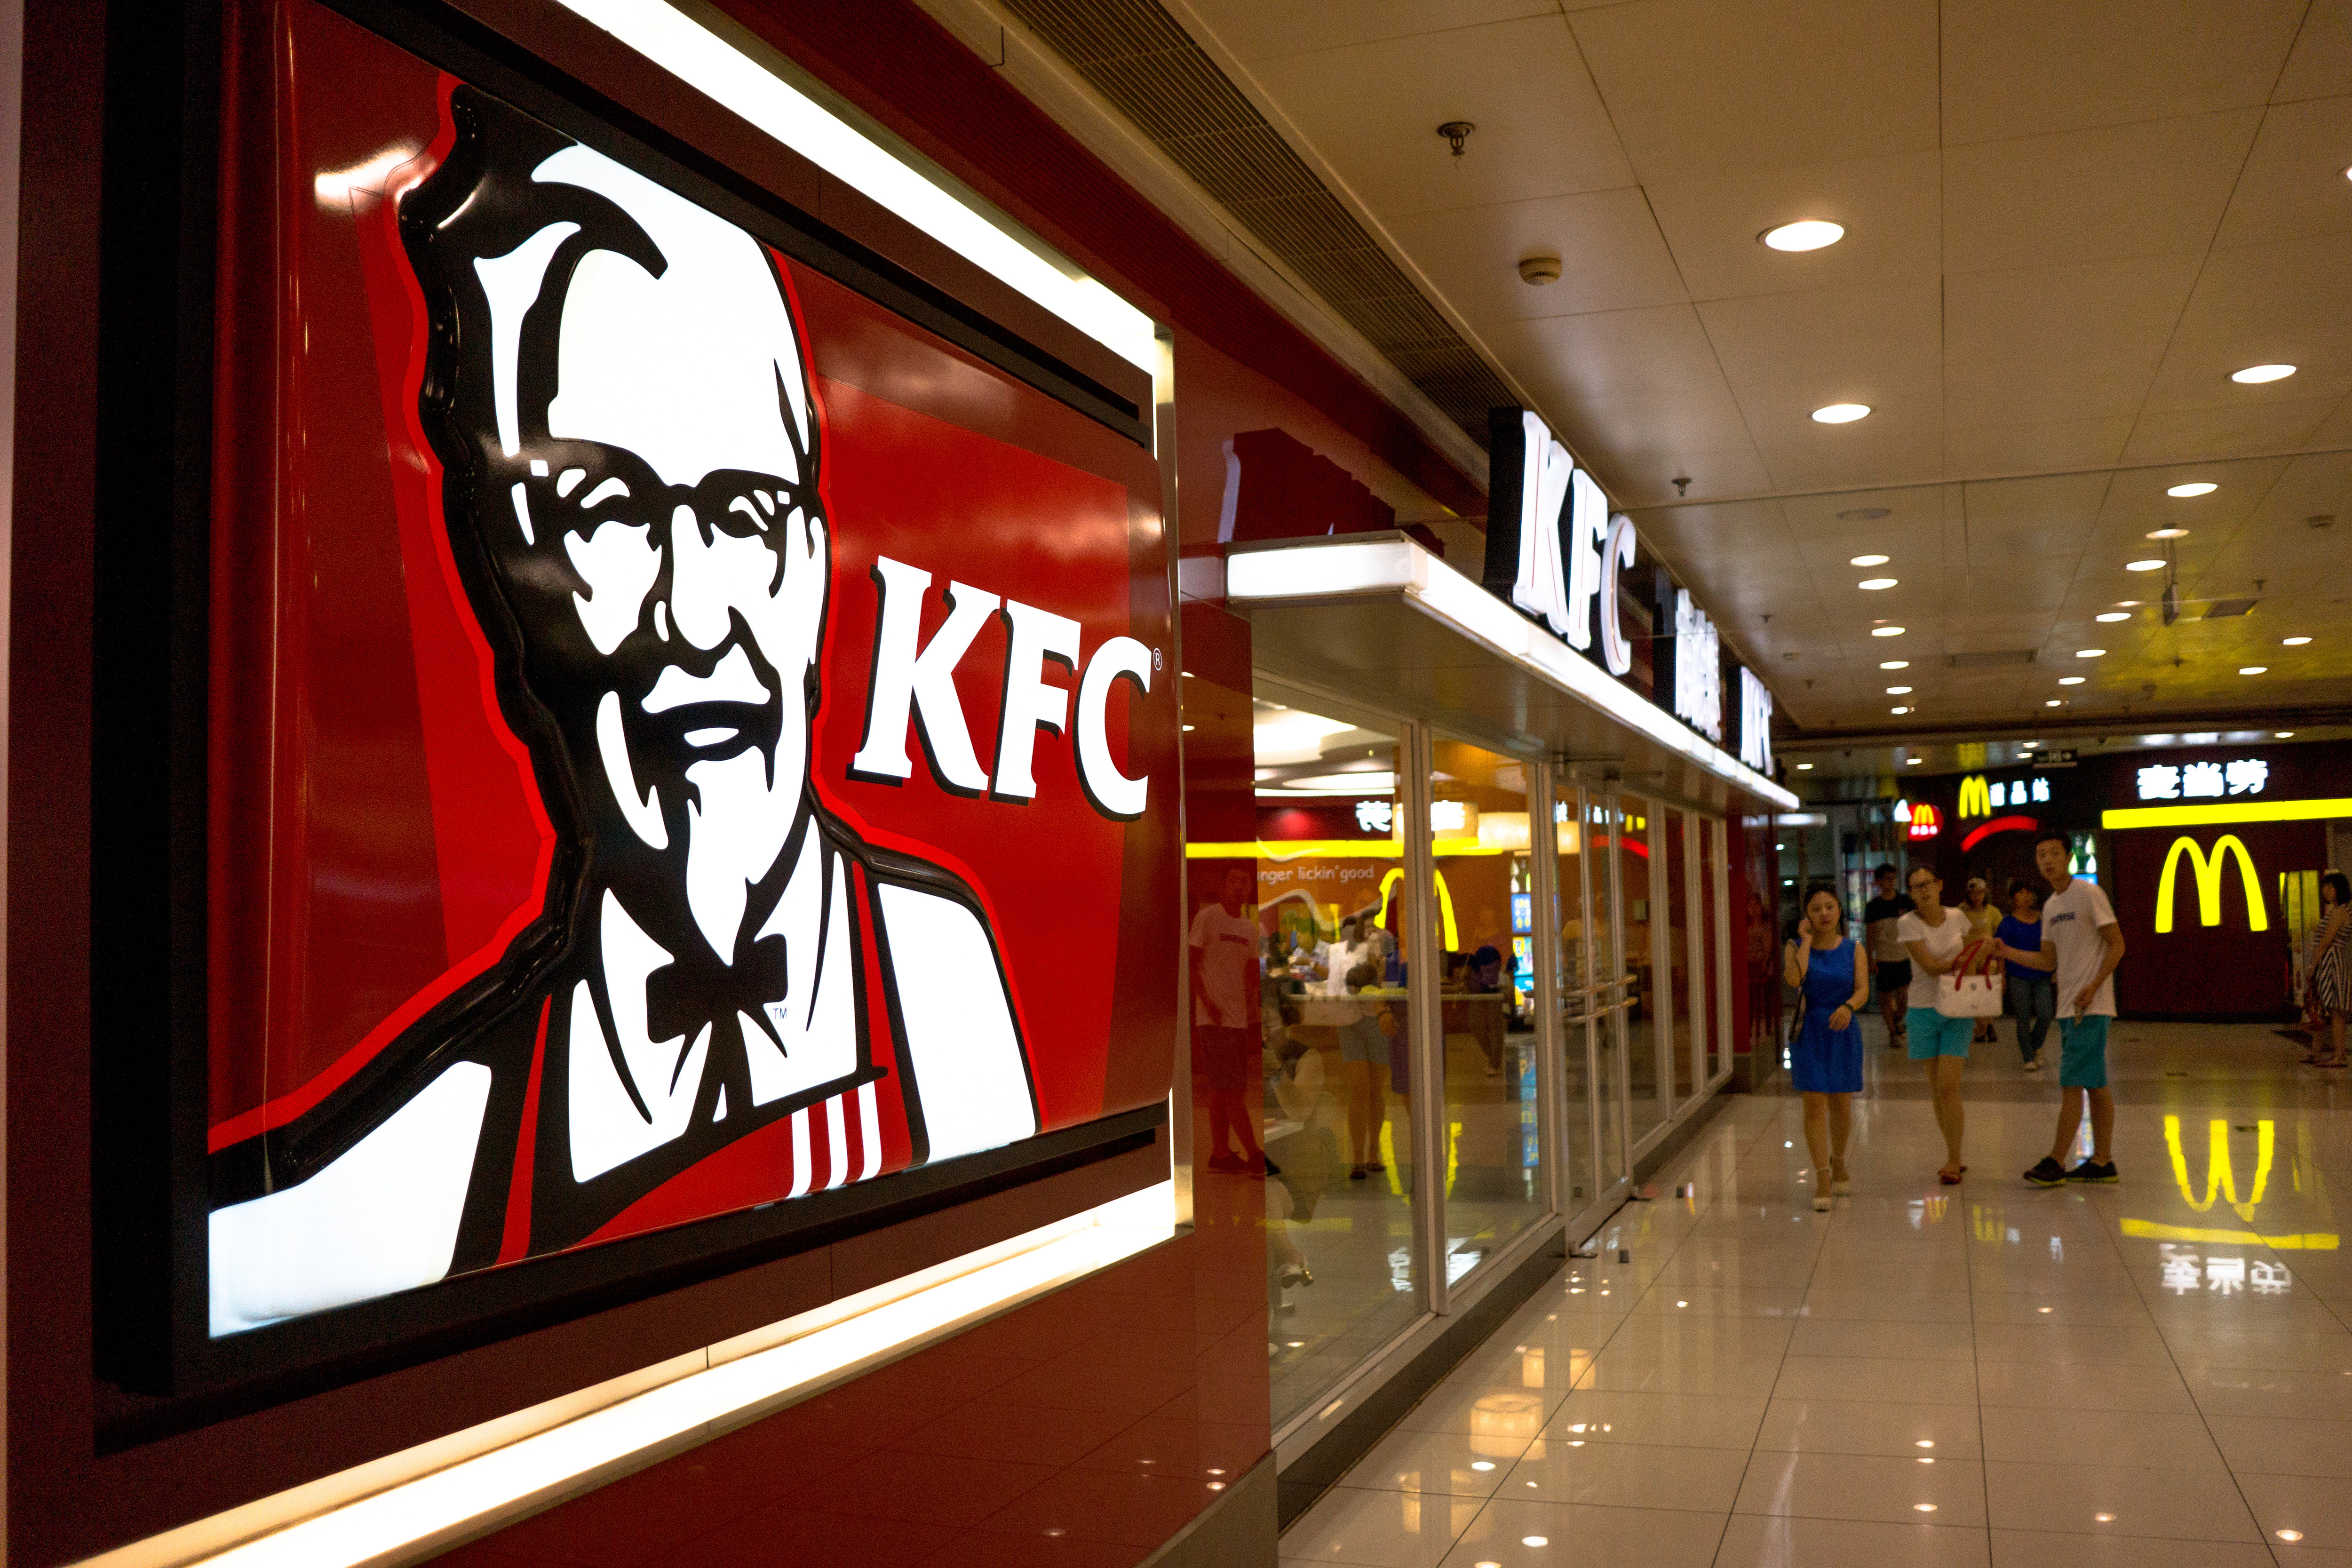 A KFC restaurant in a shopping mall.  KFC, McDonalds,